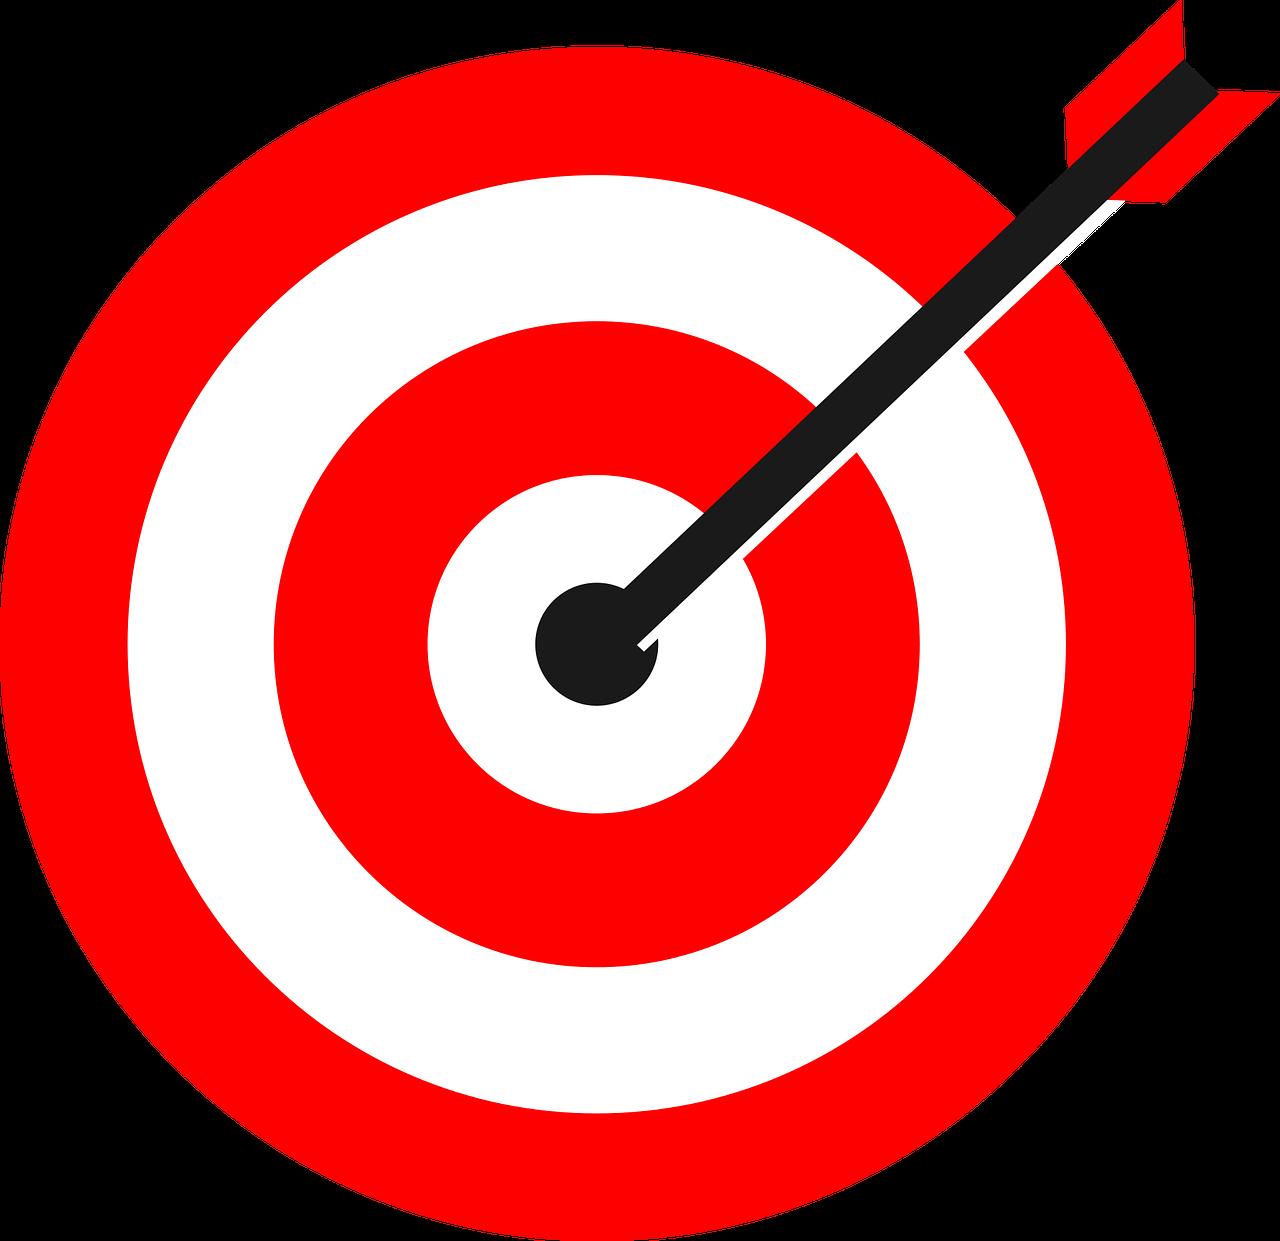 target-2070972_1280.png